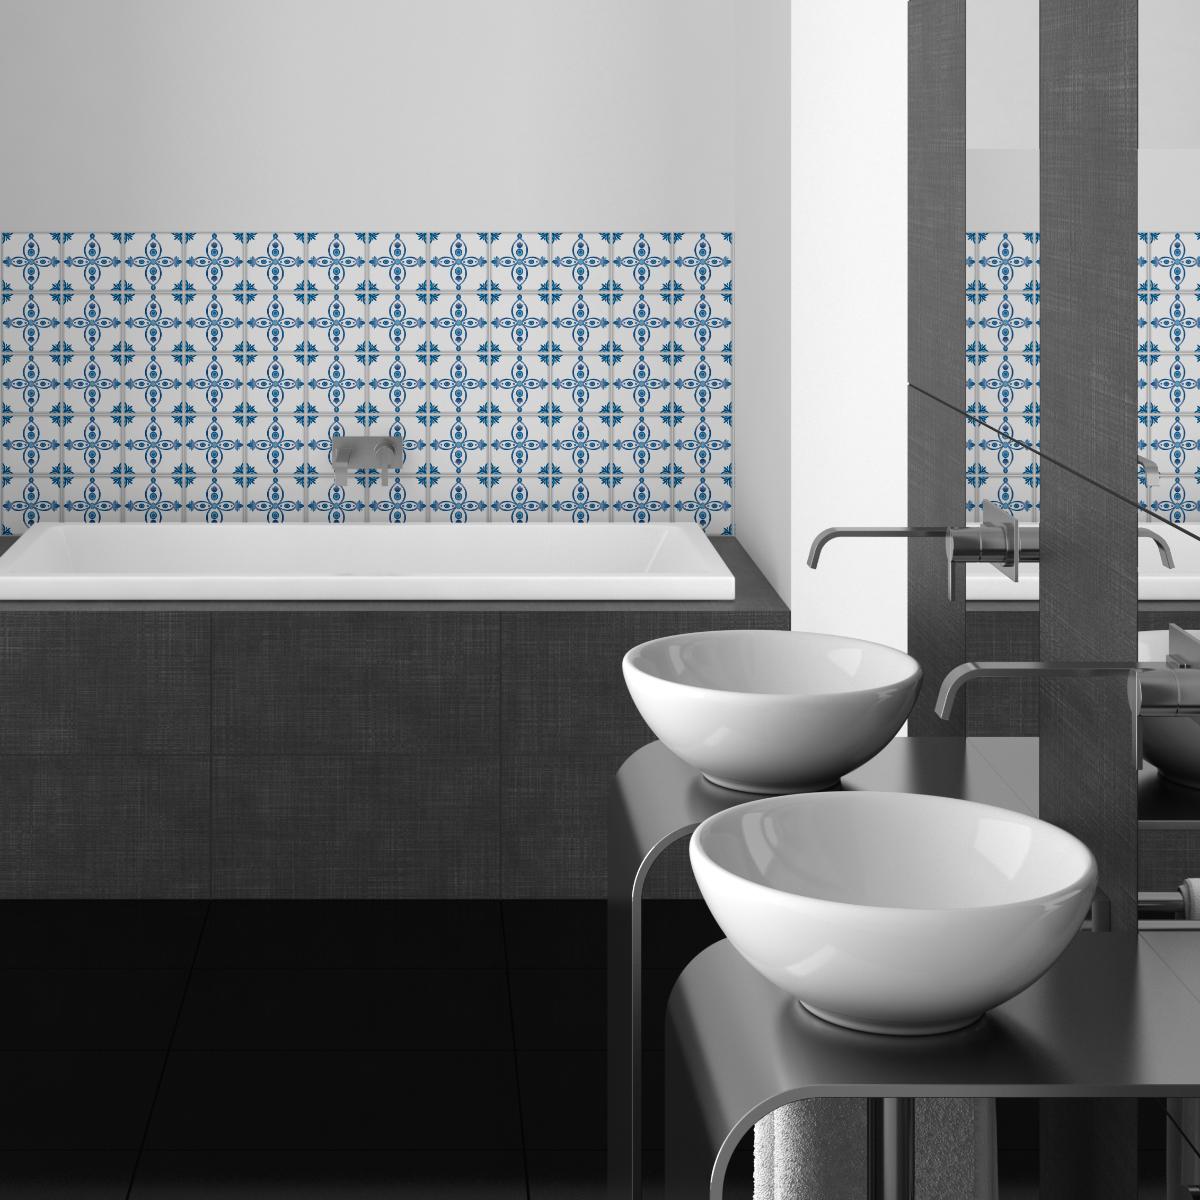 30 stickers carrelages delft amersfoort cuisine carrelages ambiance sticker. Black Bedroom Furniture Sets. Home Design Ideas